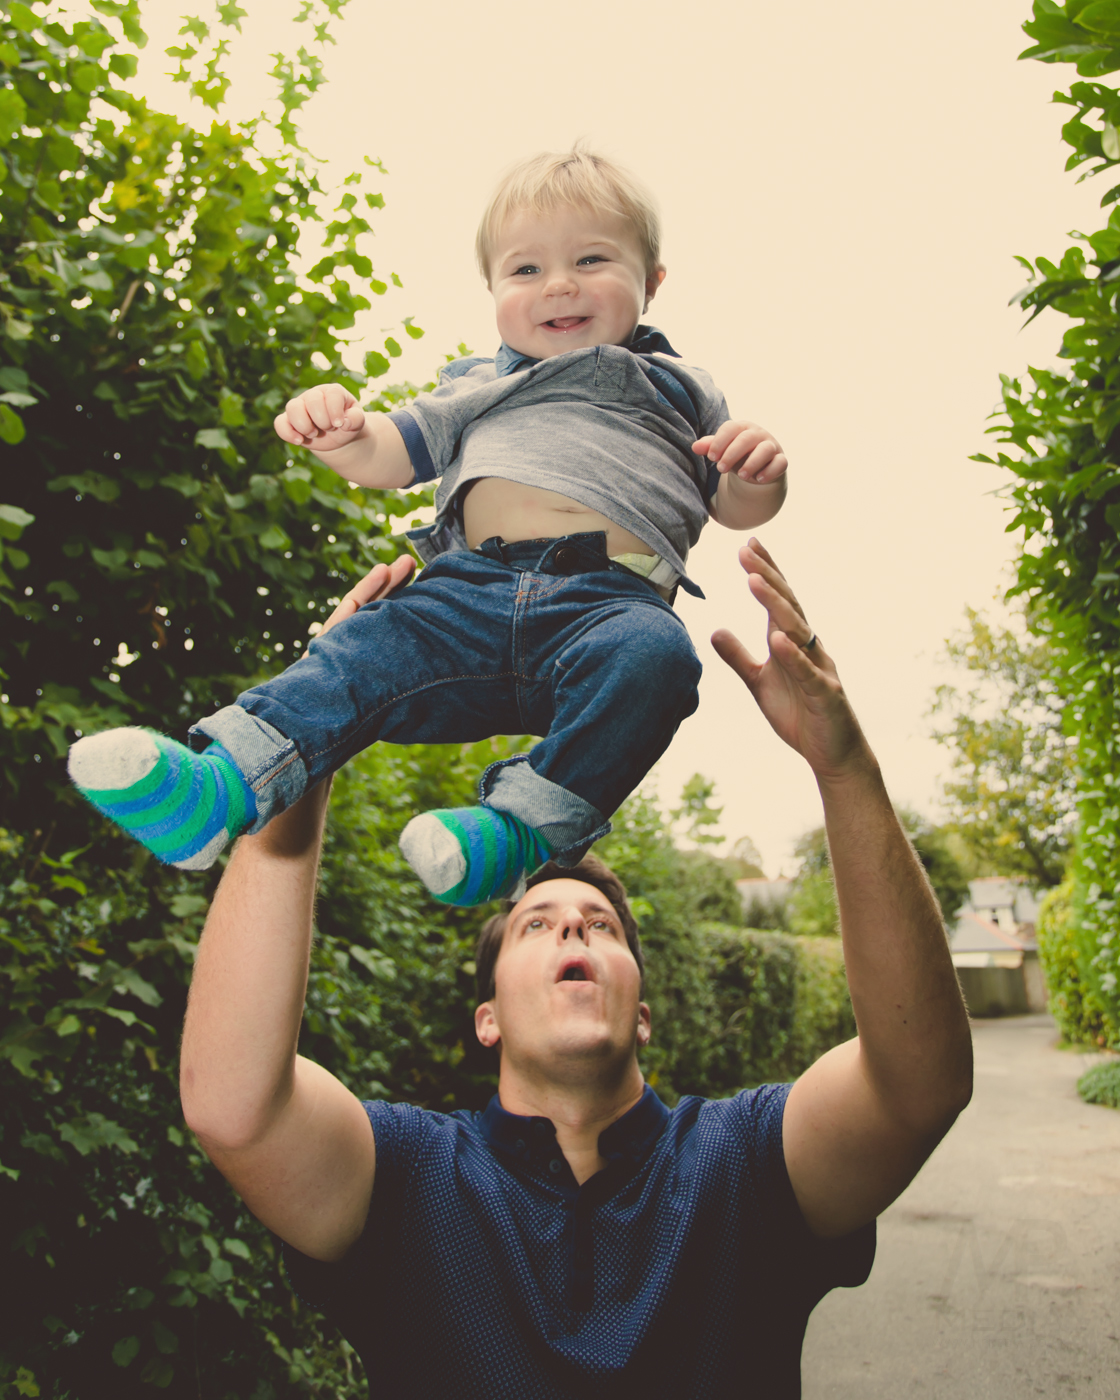 018 - Kelly, Matthew and Hugo Fine Art Family Photography by www.mpmedia.co.uk -64.JPG